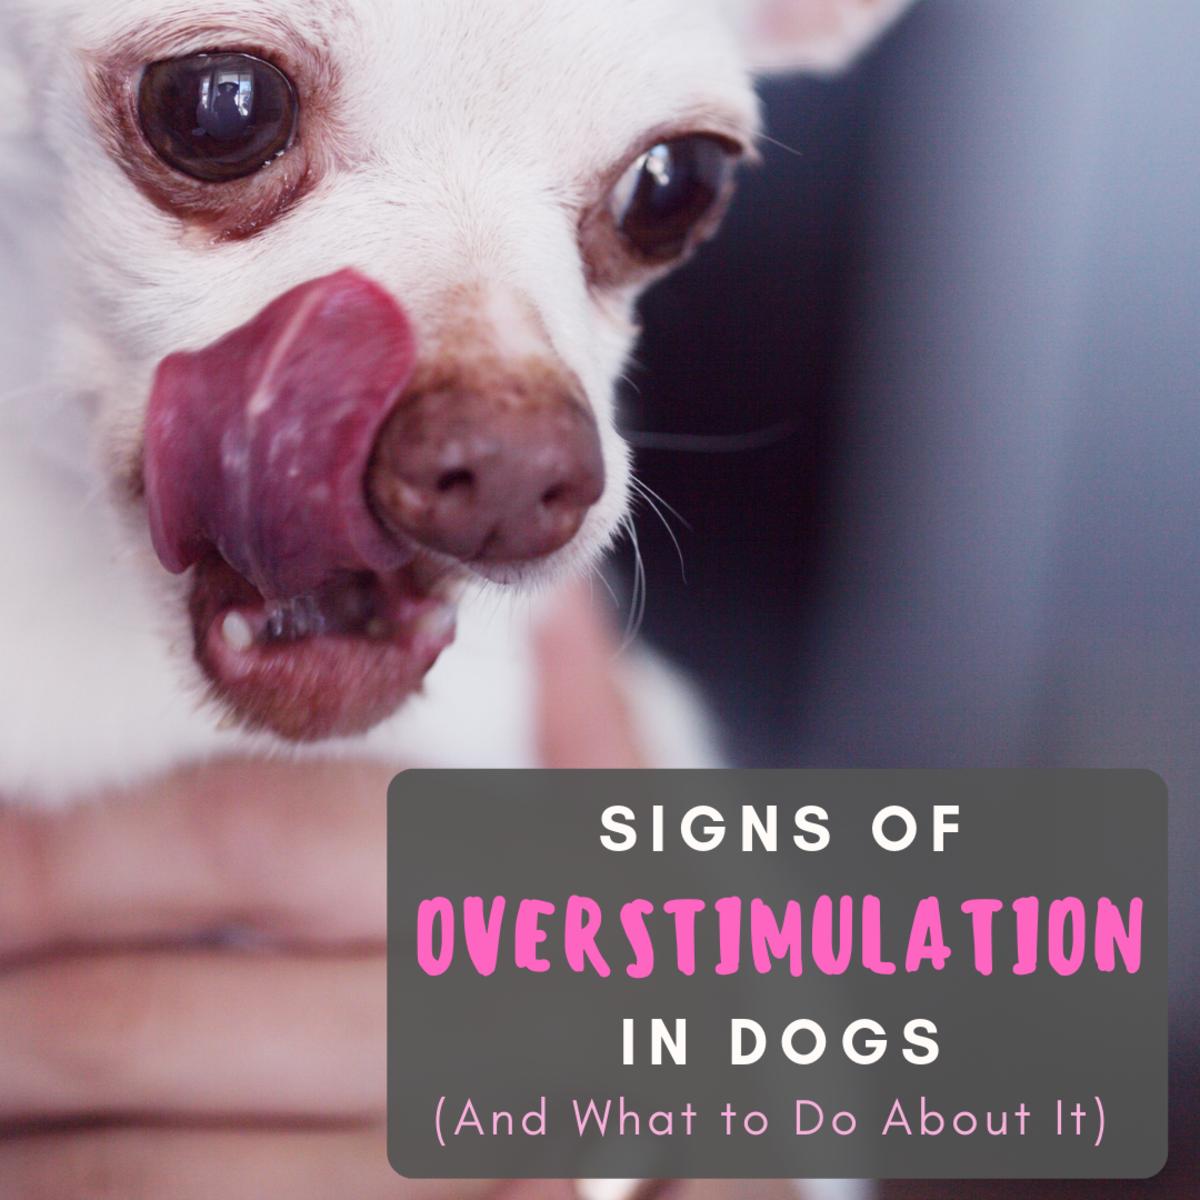 Is Sensory Overstimulation Stressing Your Dog?